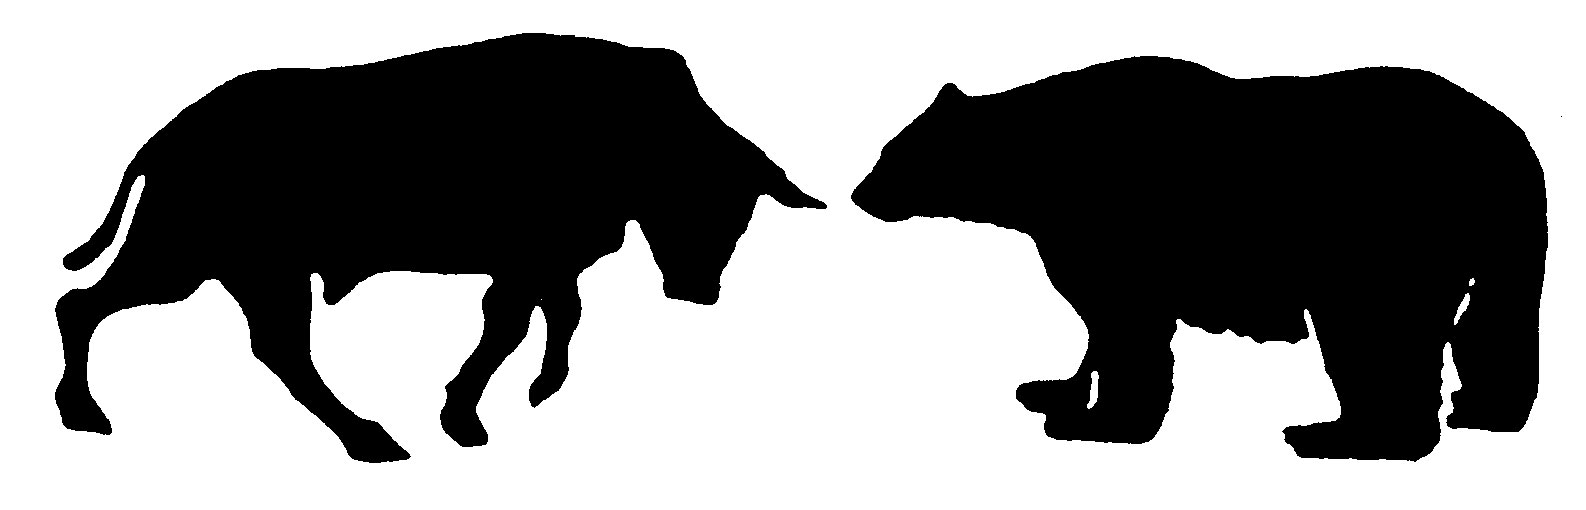 Заставки форекс-быки и медведи dlc forextrade